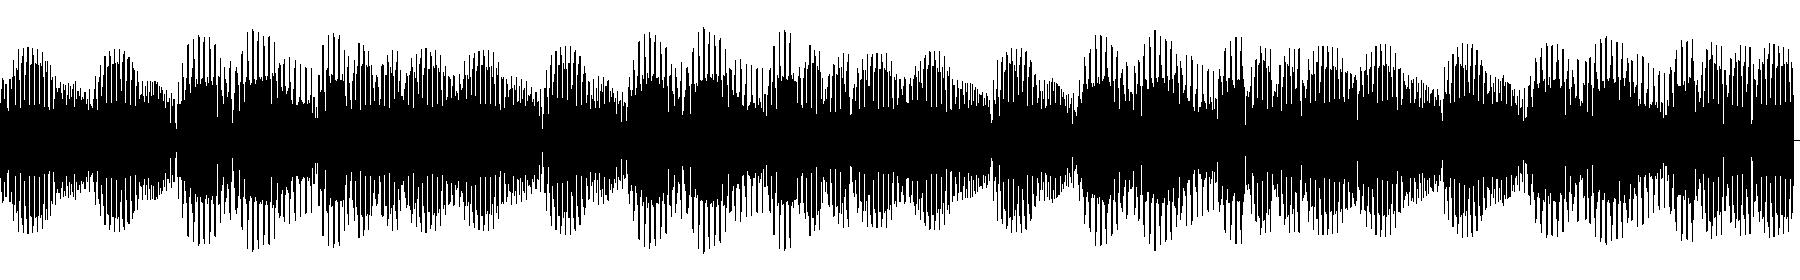 bsq 9m133 17 kornet